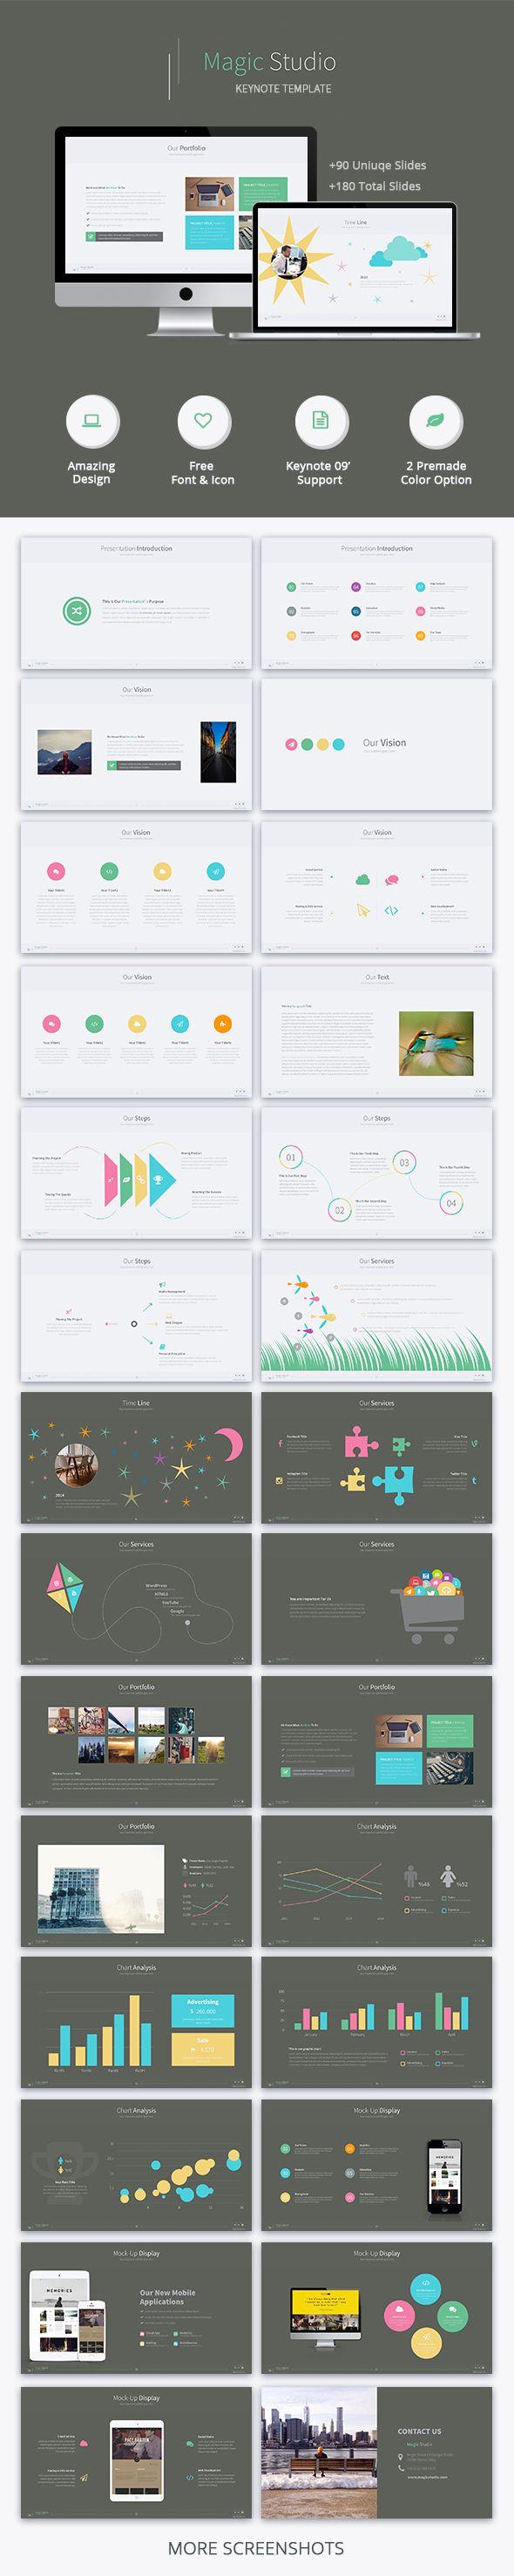 Magic Studio - Creative Keynote Template #design #slides Download: http://graphicriver.net/item/magic-studio-creative-keynote-template/13346513?ref=ksioks